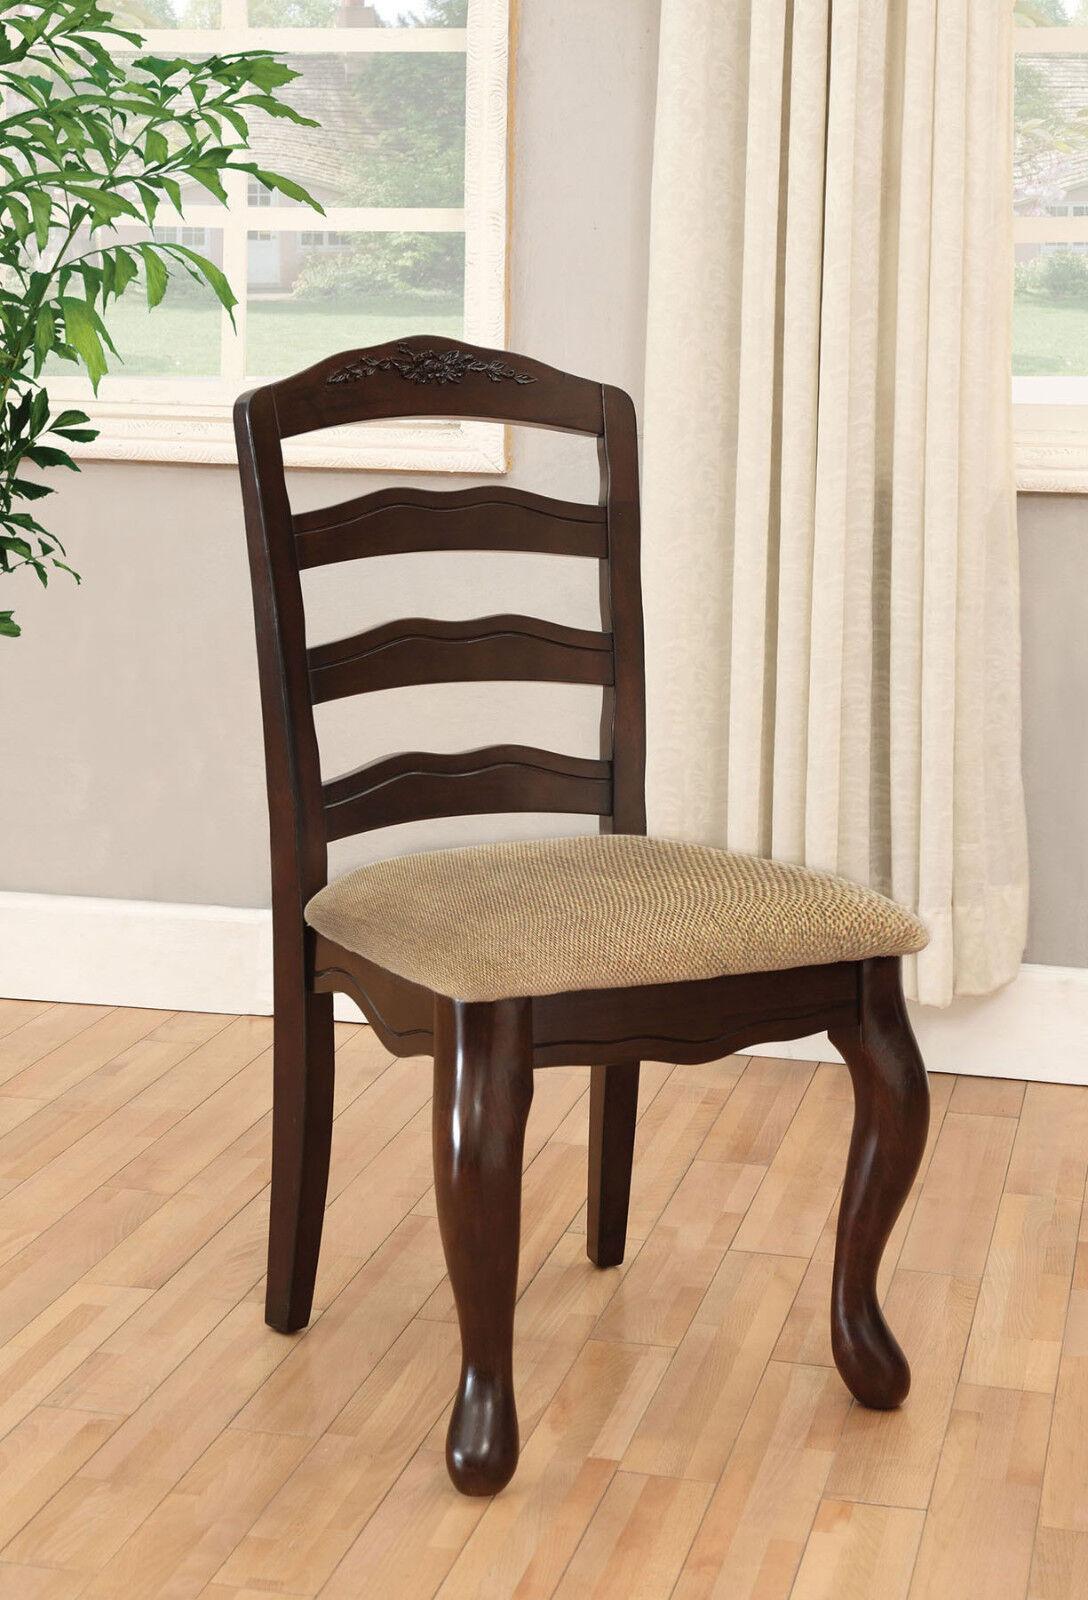 Modern Townsville Set of 4pc Side Chairs Dark Walnut Wood Dining Furniture